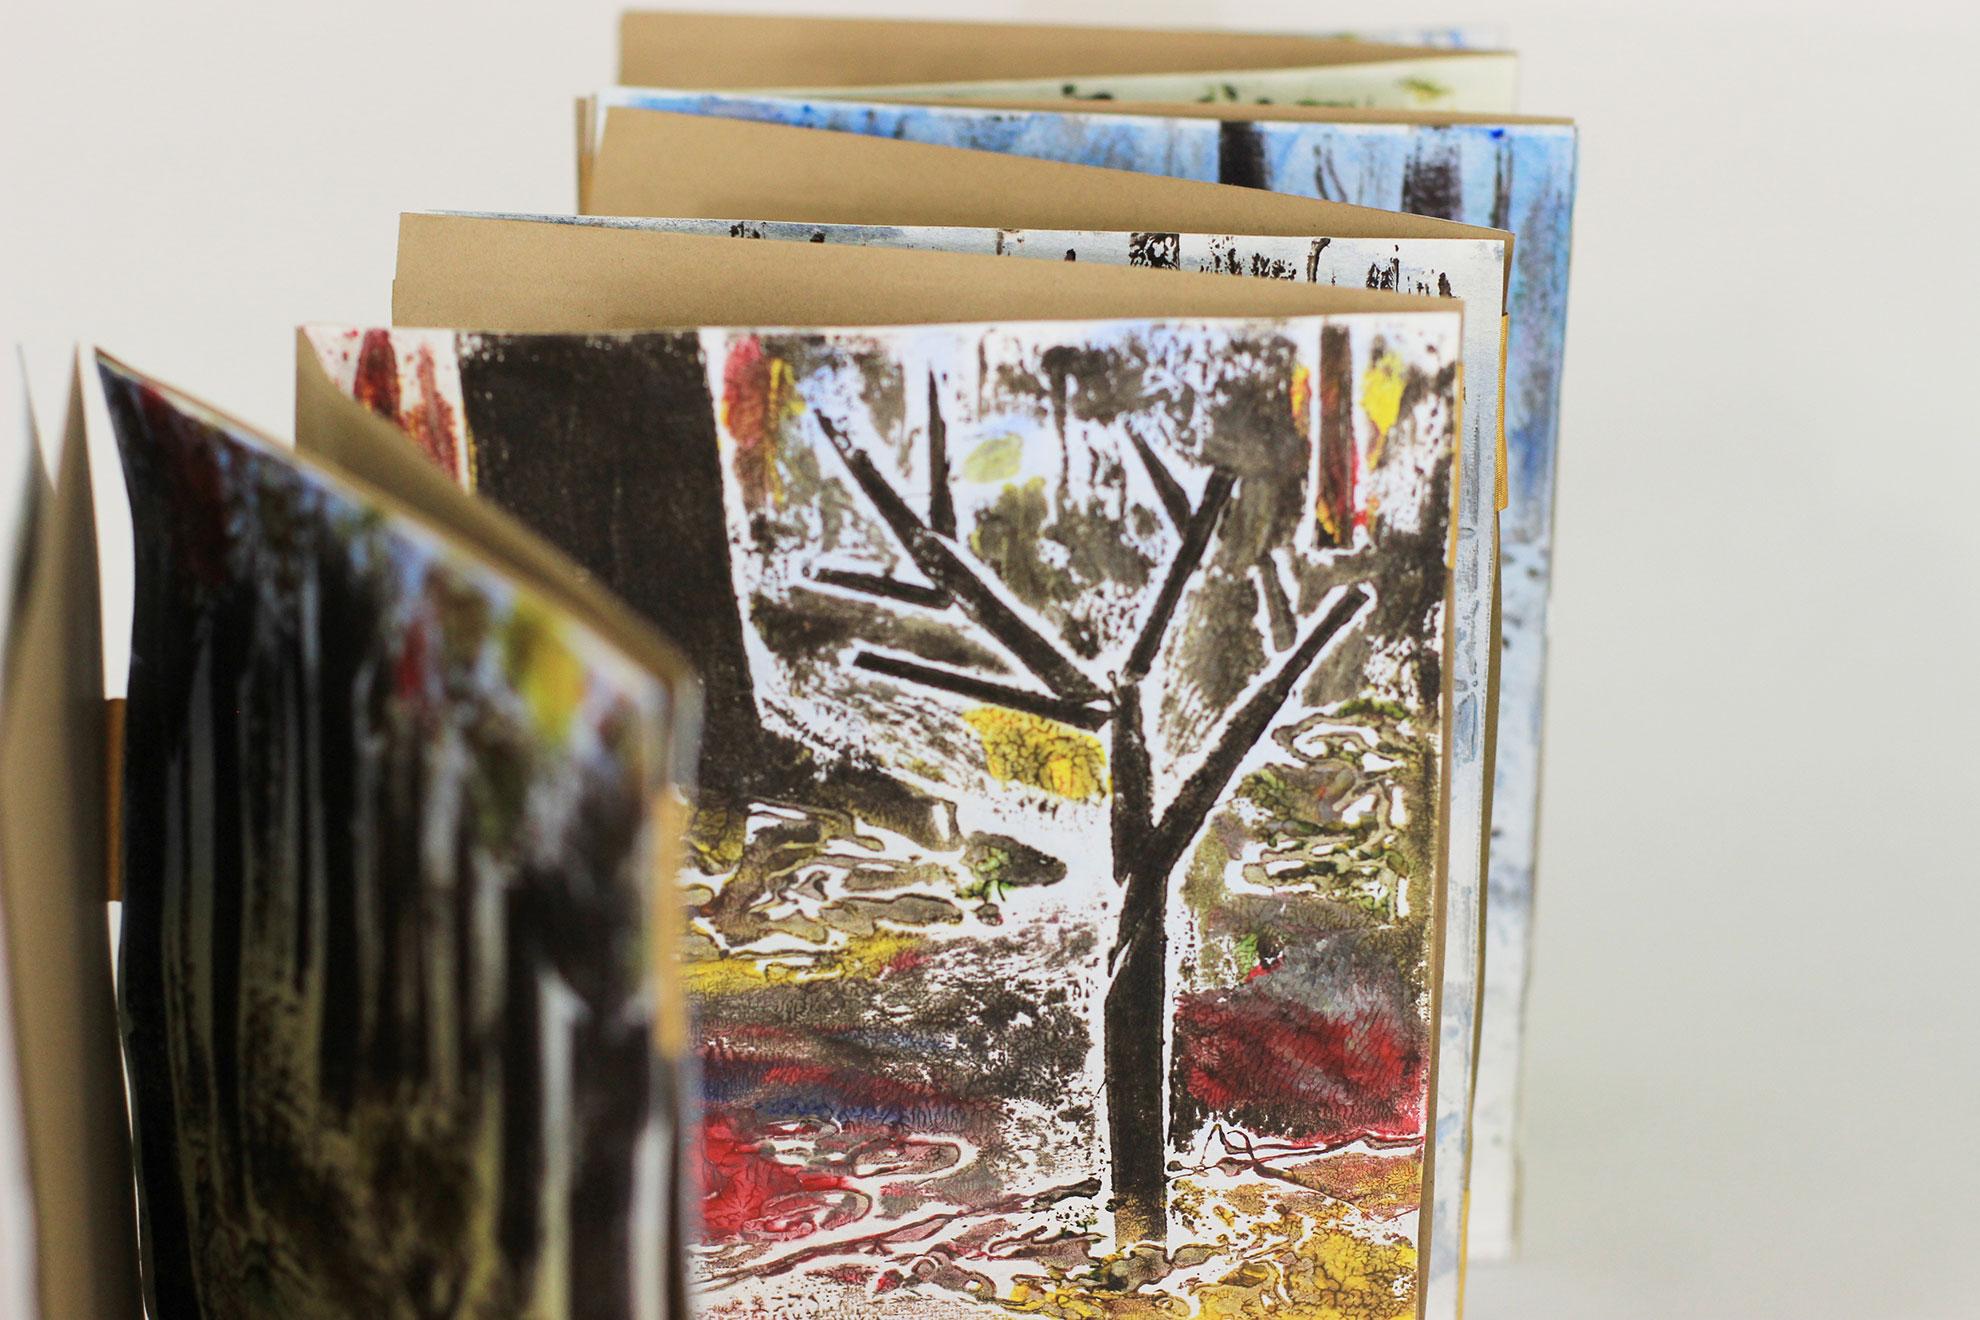 Anna Barhart and J Charles, The Sapling, Acrylic Collagraphy, 2018, Kalamazoo, MI